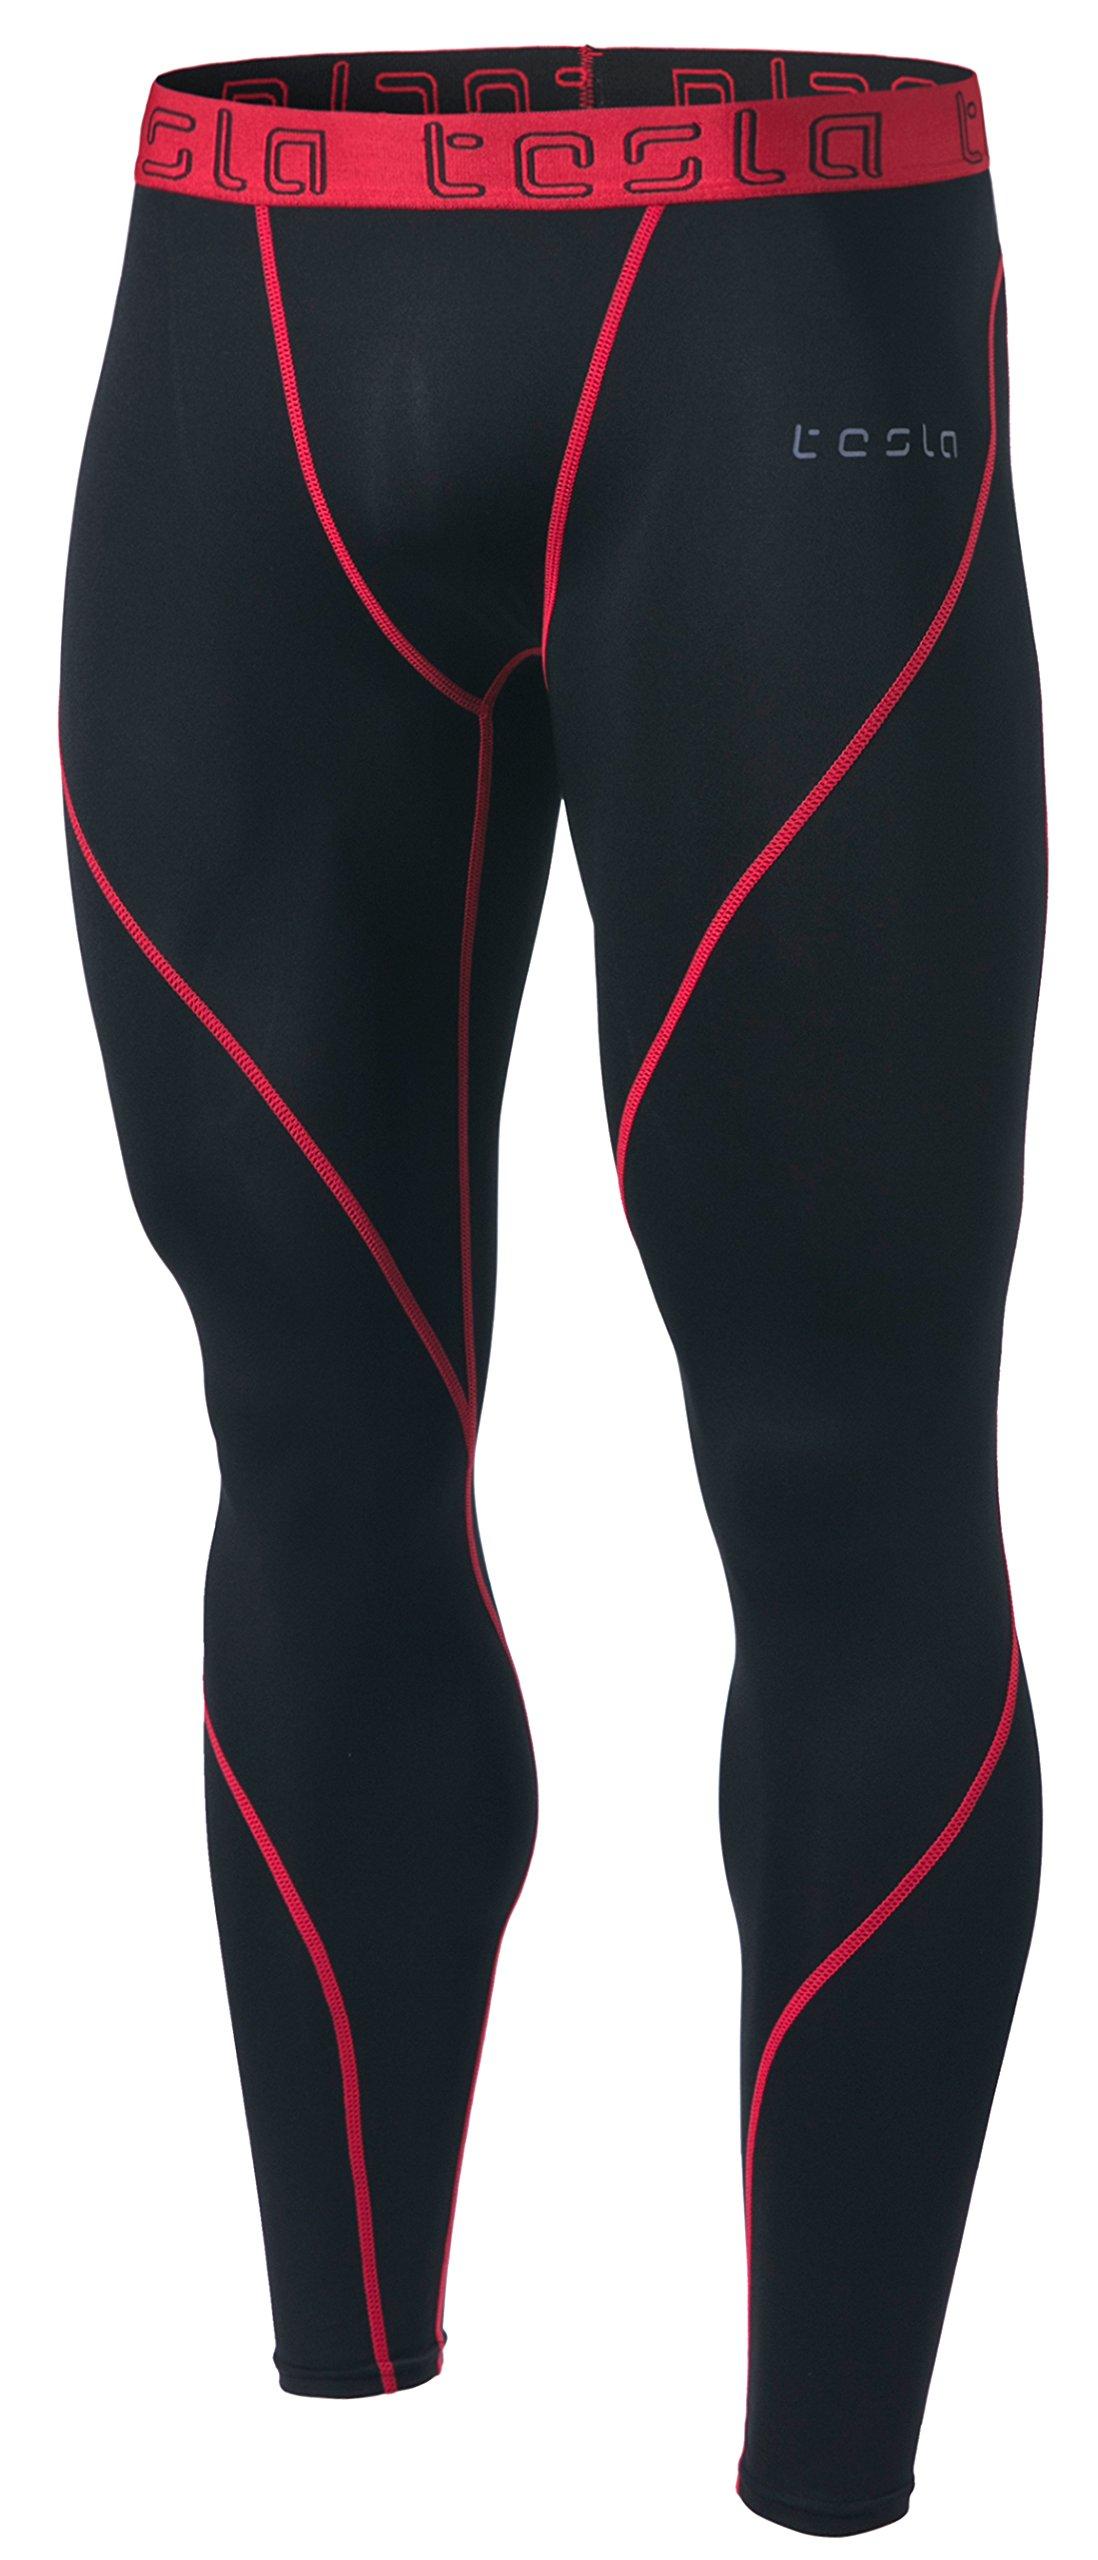 TSLA DRST TM-MUP19-KKR_2X-Large Men's Compression Pants Baselayer Cool Dry Sports Tights Leggings MUP19